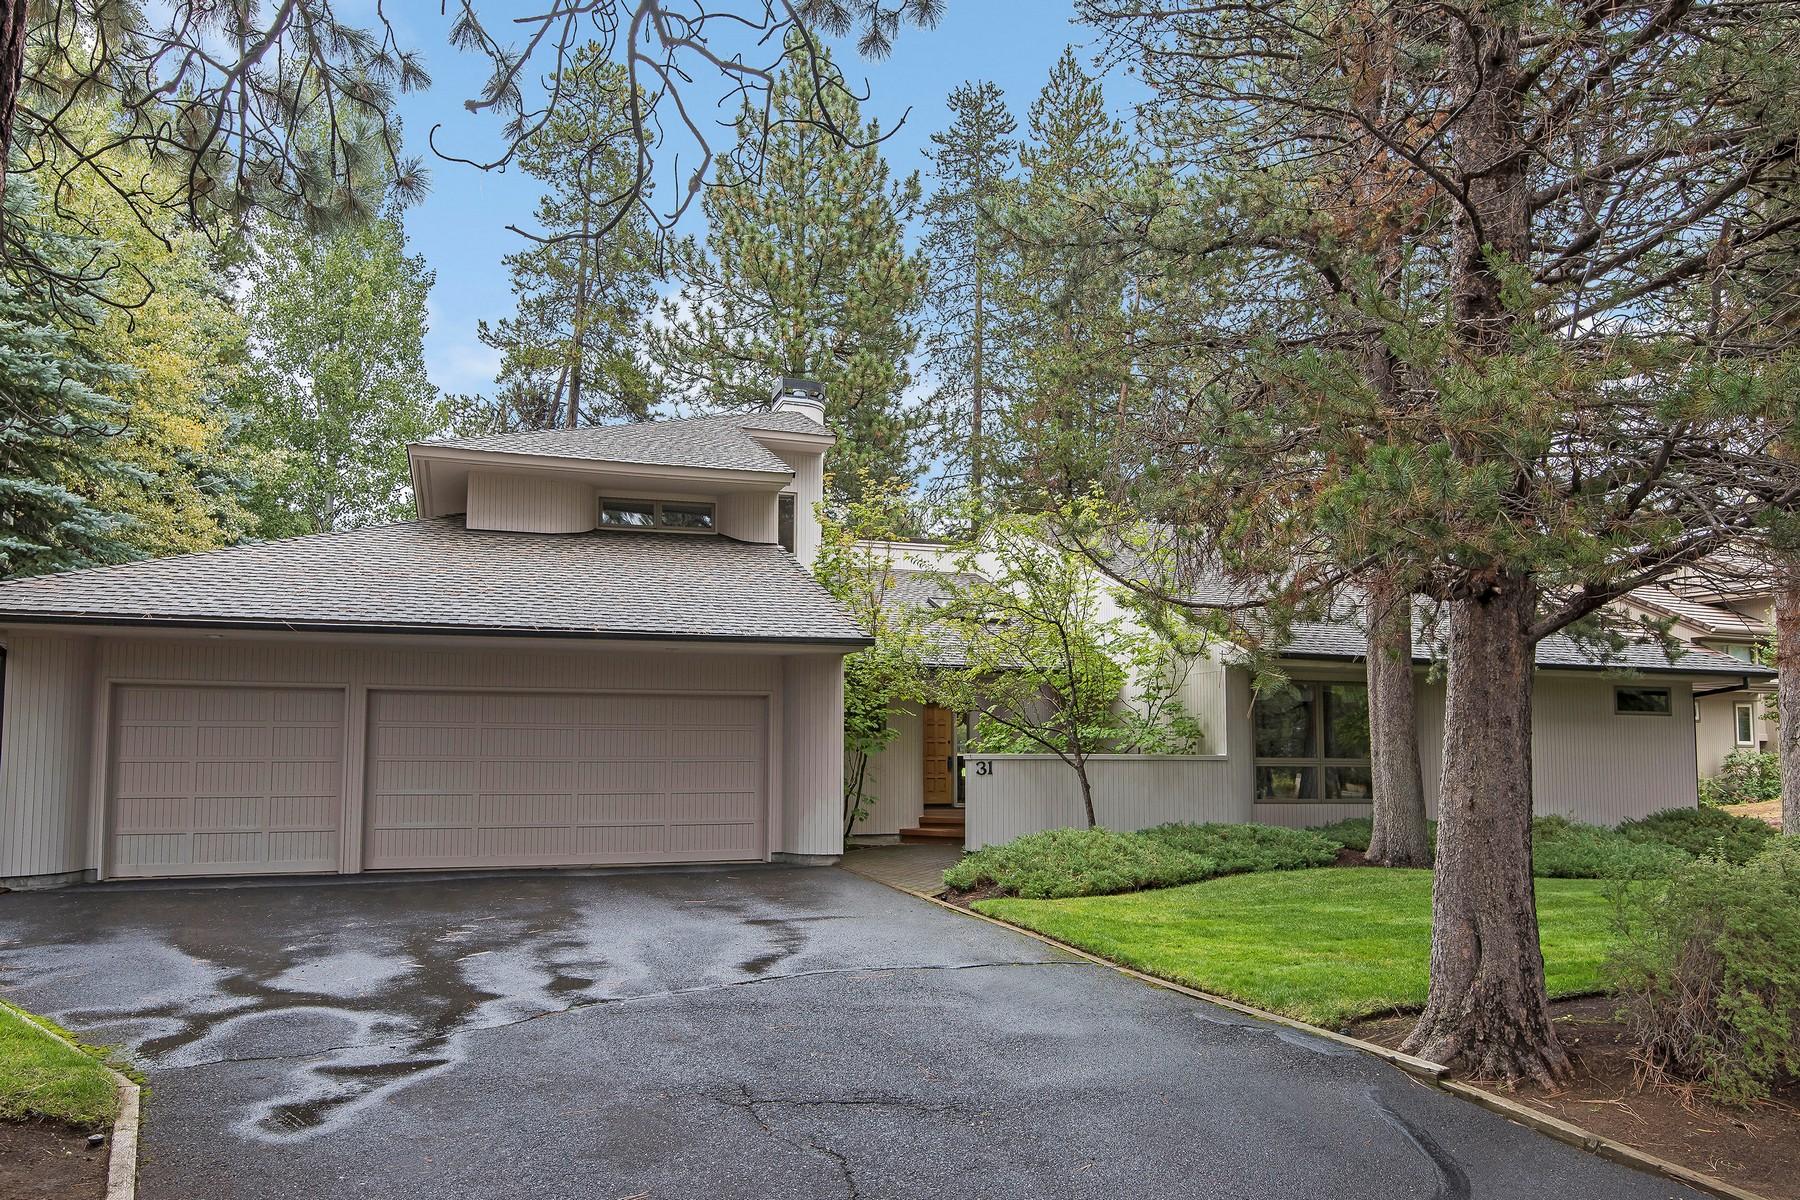 Other Residential Homes για την Πώληση στο 58046 Winners Circle Unit 31 Sunriver, OR 97707 Sunriver, Ορεγκον 97707 Ηνωμένες Πολιτείες